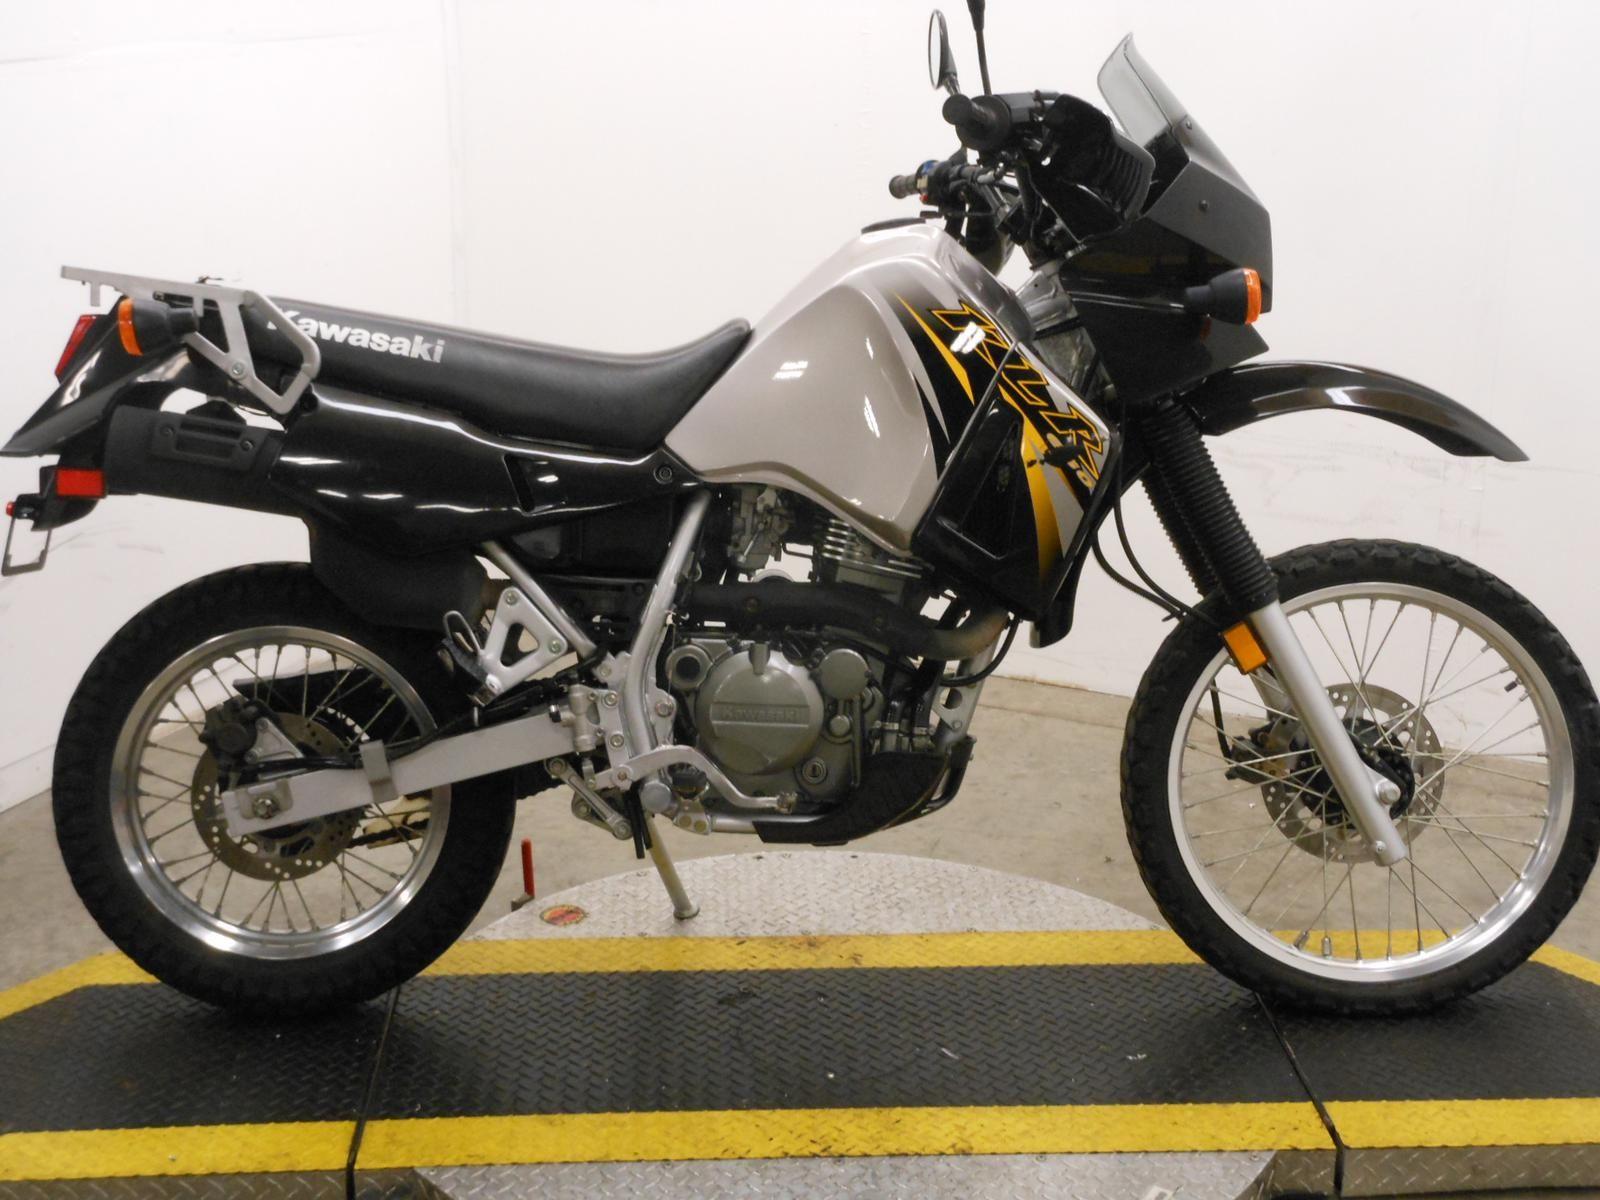 New & Used 2007 Kawasaki KLR650 KLR 650 Enduro Dual Sport Ad Motorcycles  for Sale $3,795